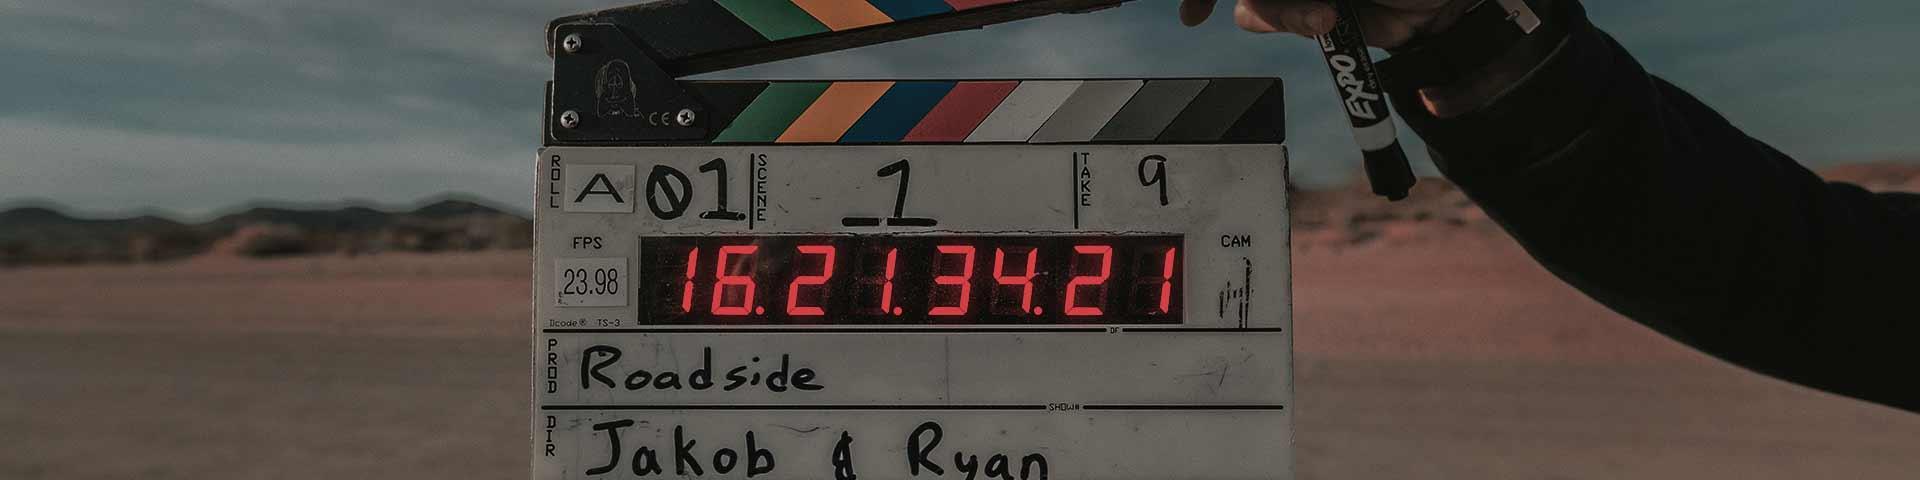 carrera de cine digital en linea